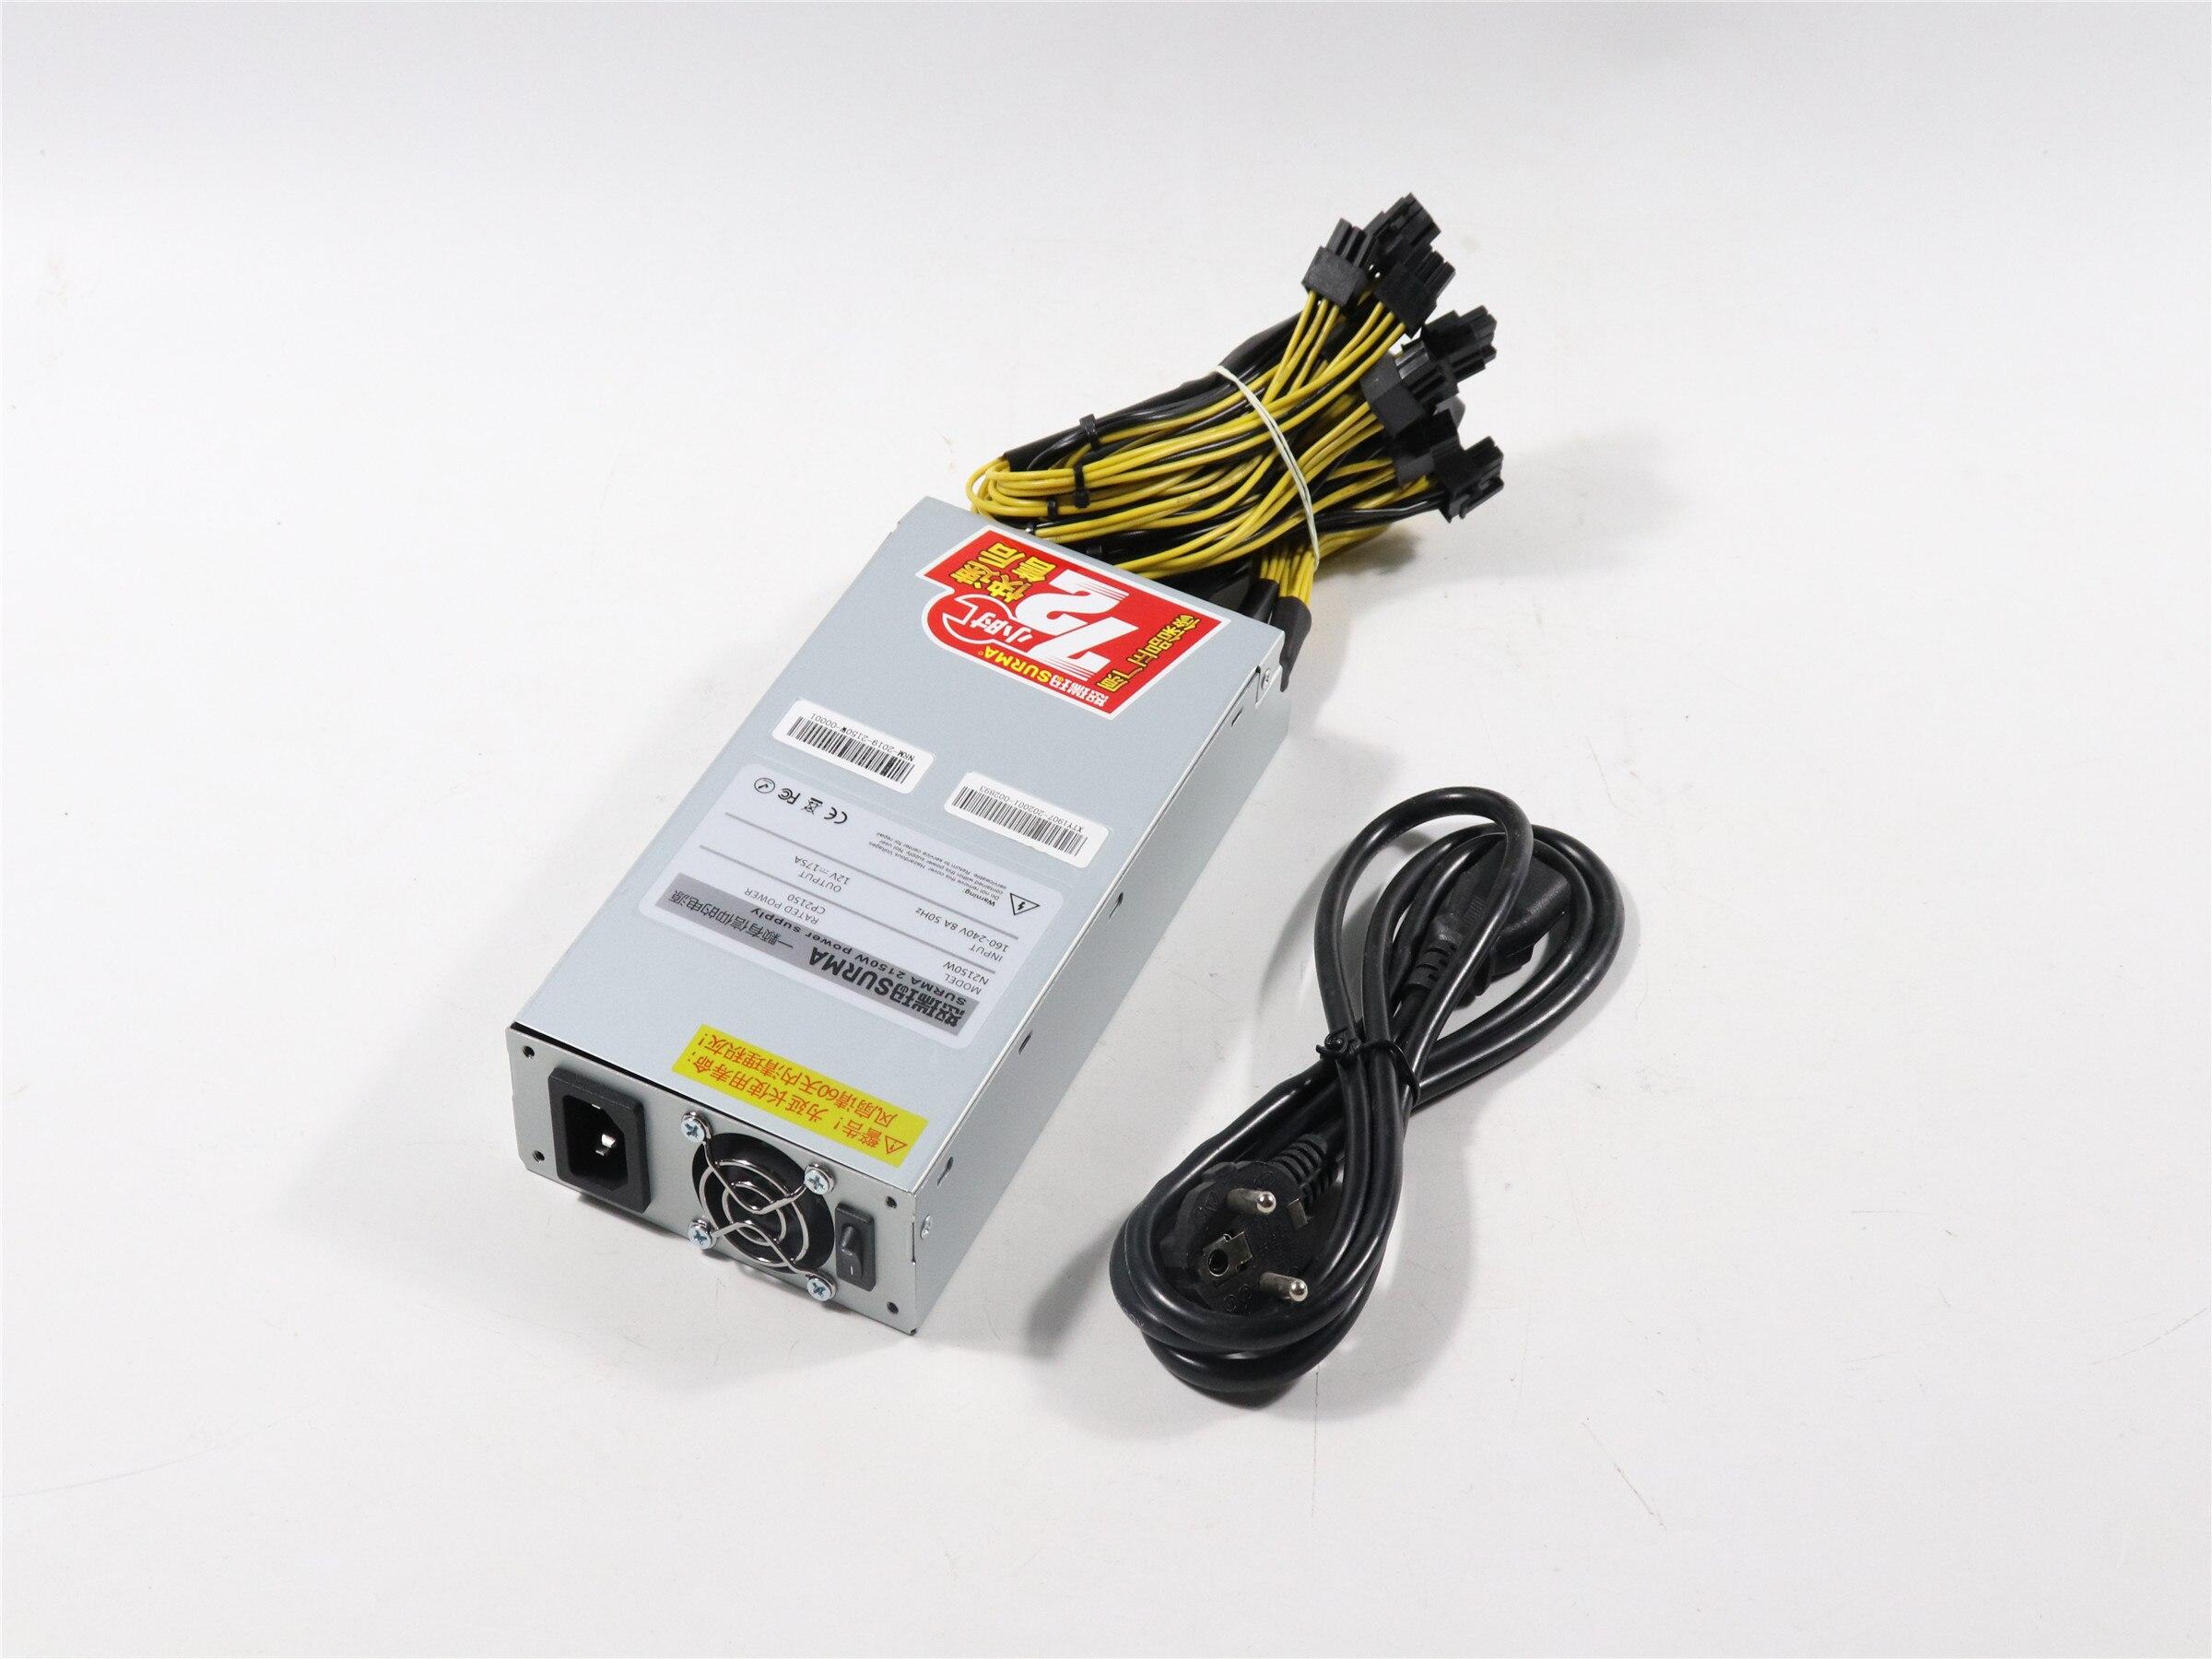 New ZEC BTC LTC DASH Miner PSU 2150W Power Supply For Antminer S9 S9j S9k S9 SE L3+ E3 Z9 Z11 T9 Innosilicon A9 Ebit E9i ETH PSU